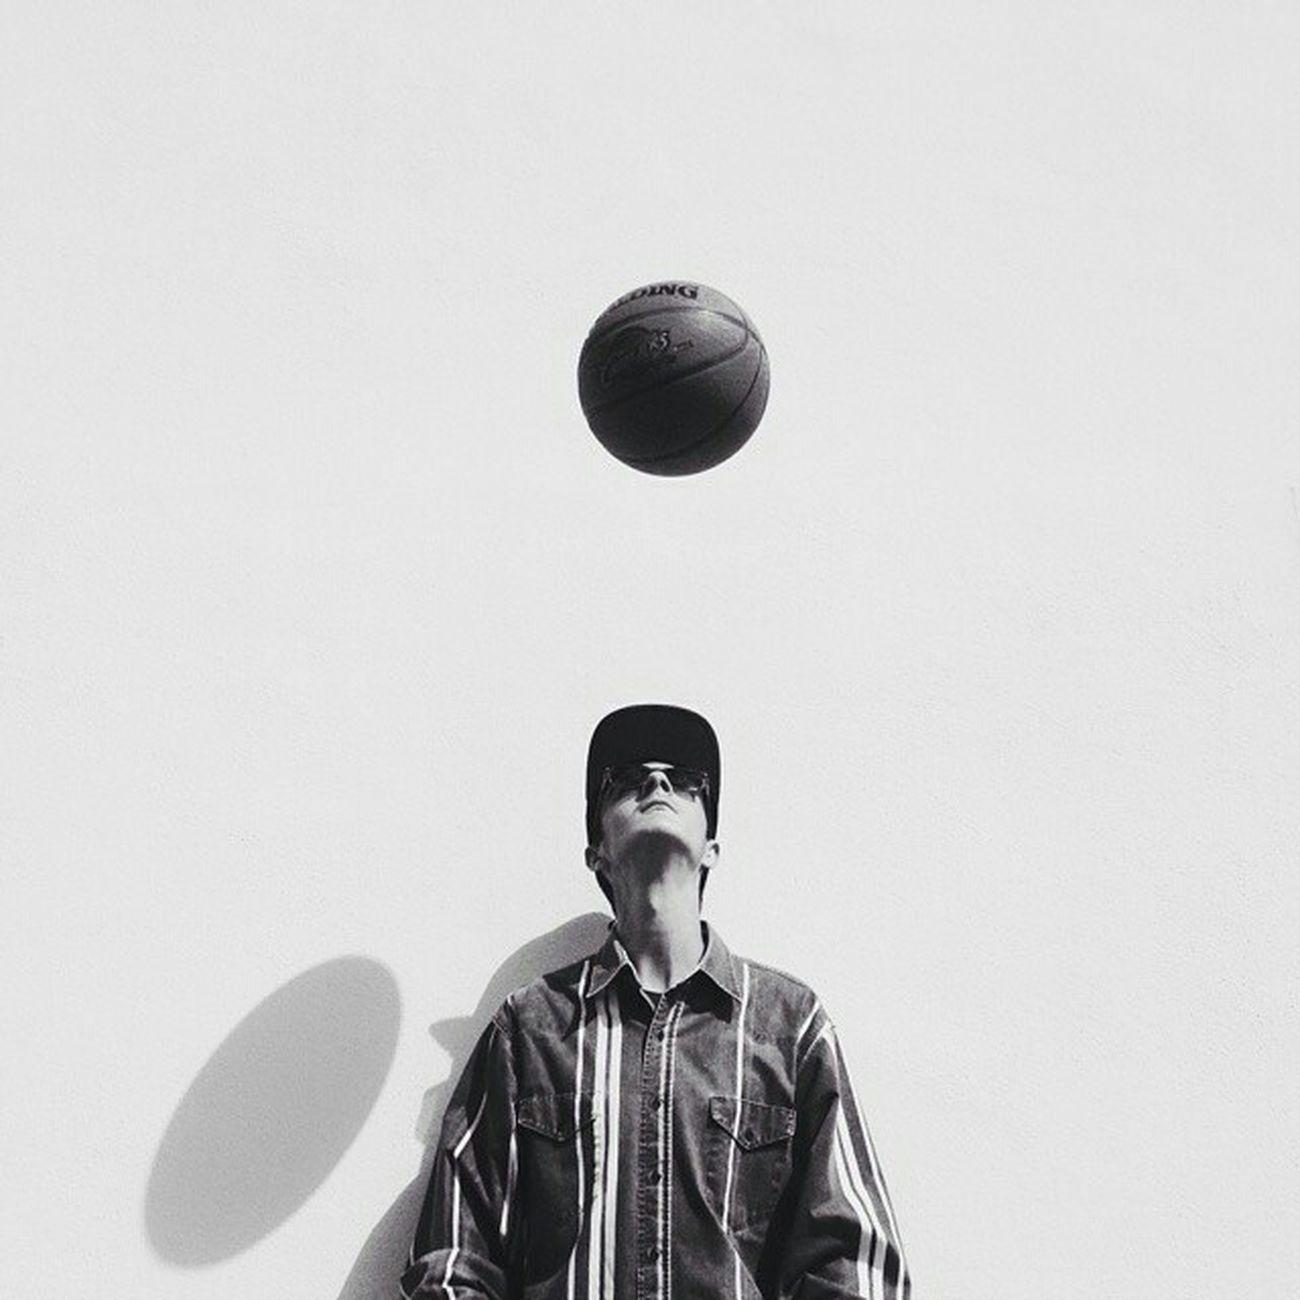 Creative Light And Shadow Bnw Bnwportrait Portrait Shootermag Basketball Bnw_captures Eyemblackandwhite